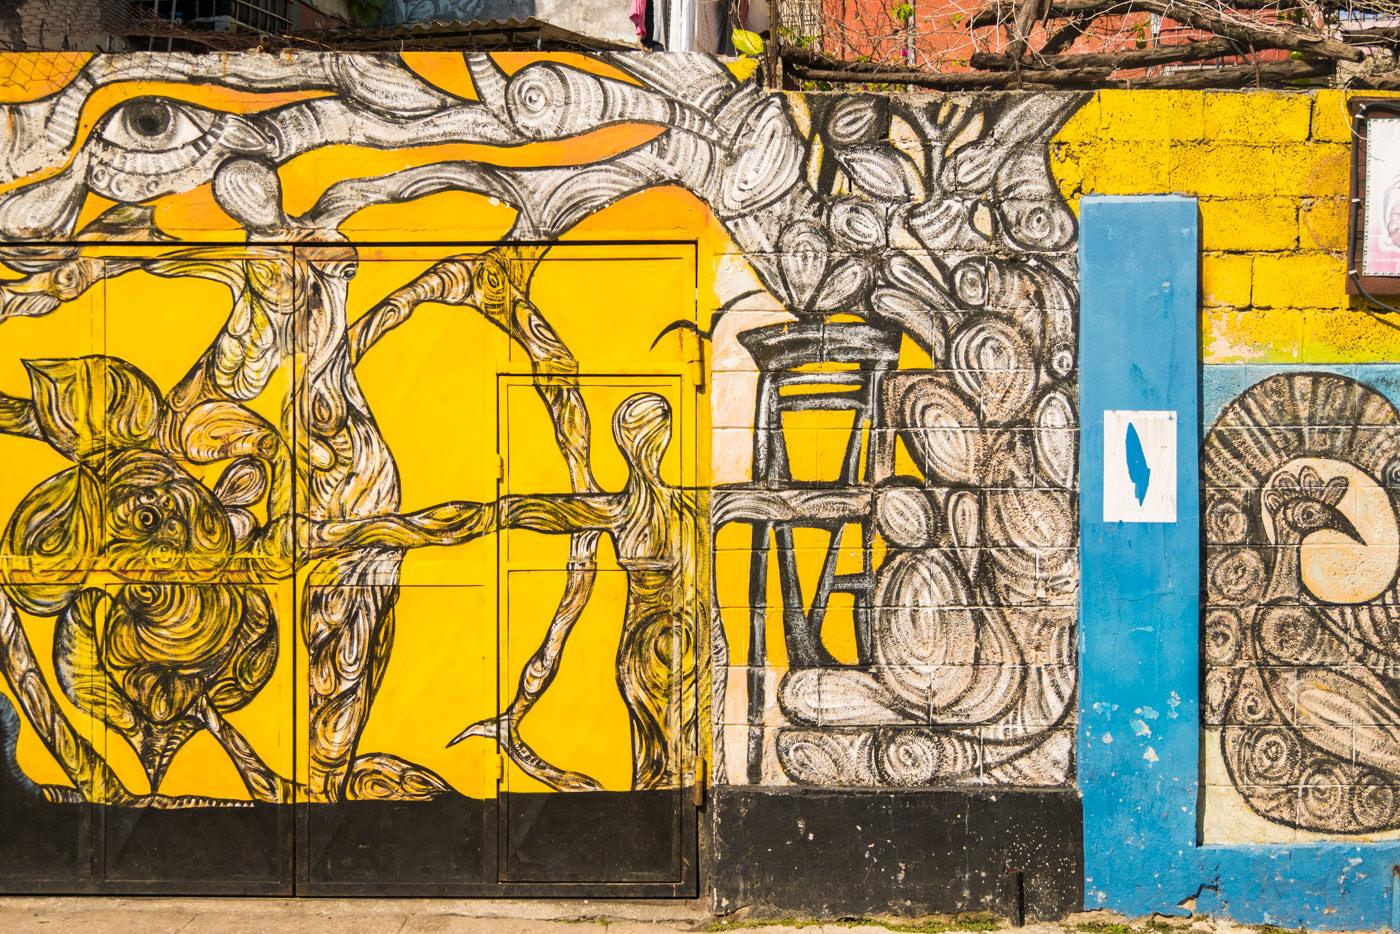 Ein Mural im Callejon de Hamel